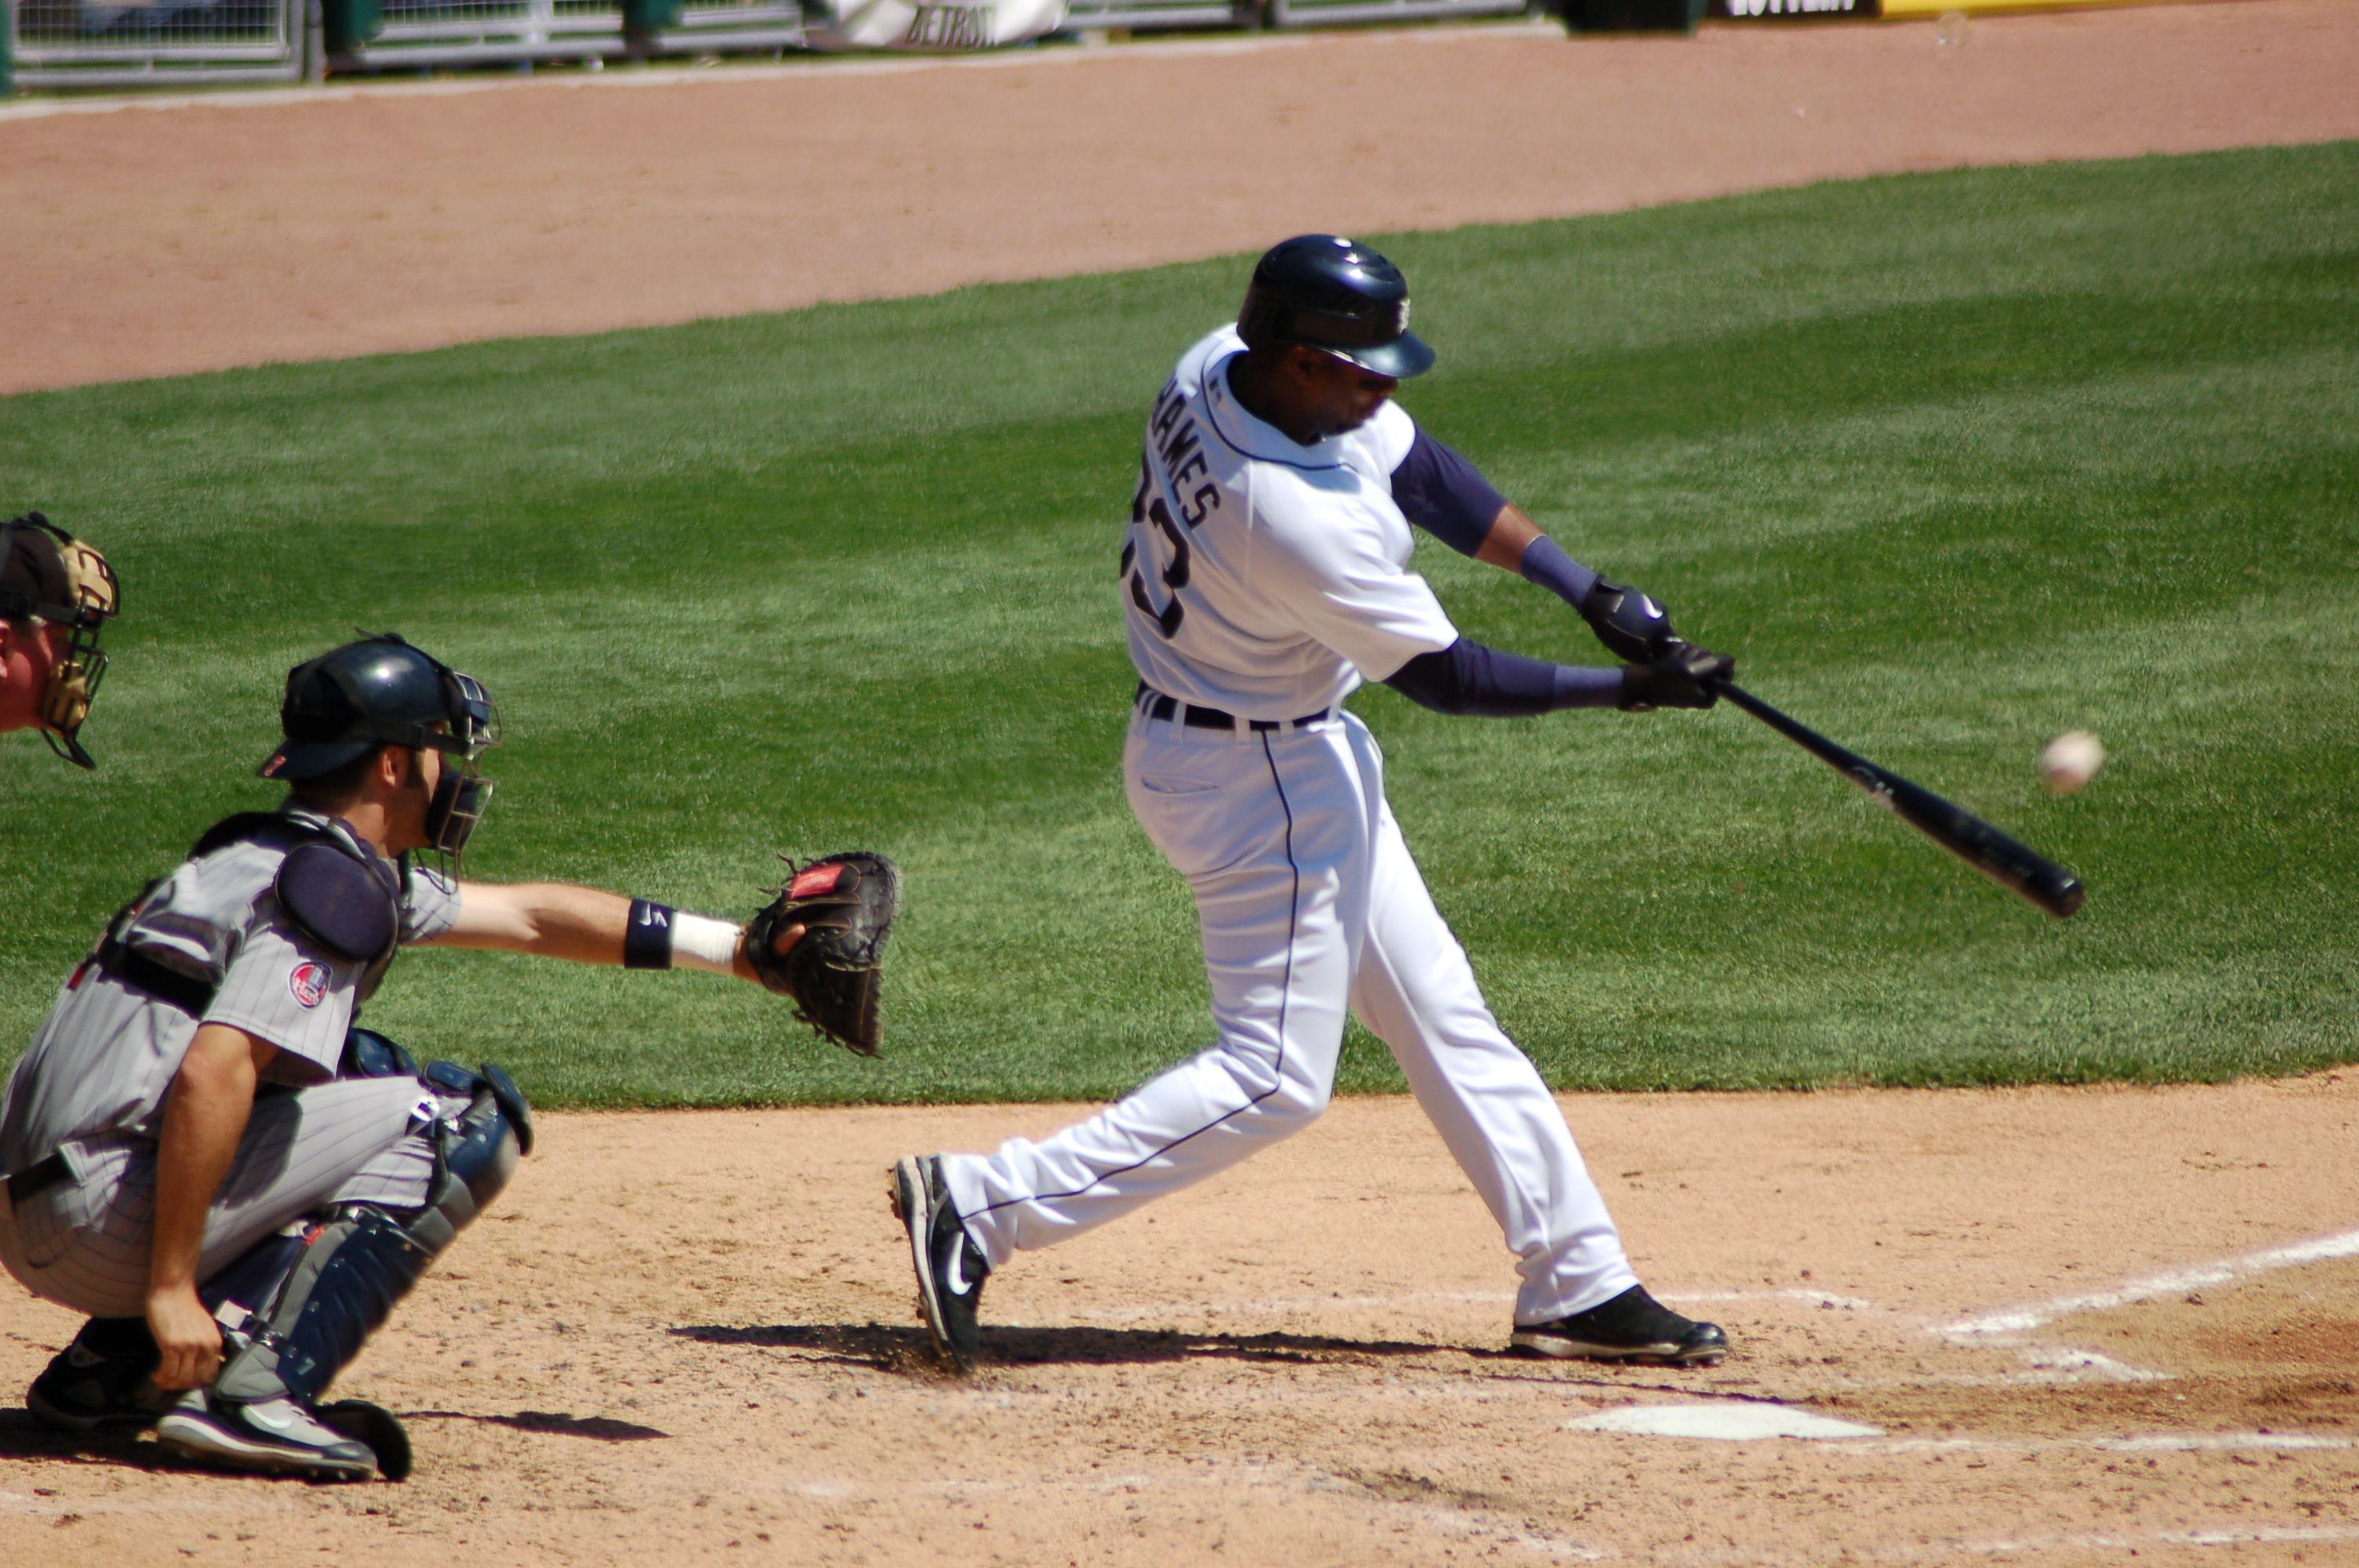 Batting Baseball Wikipedia The Free Encyclopedia Baseball